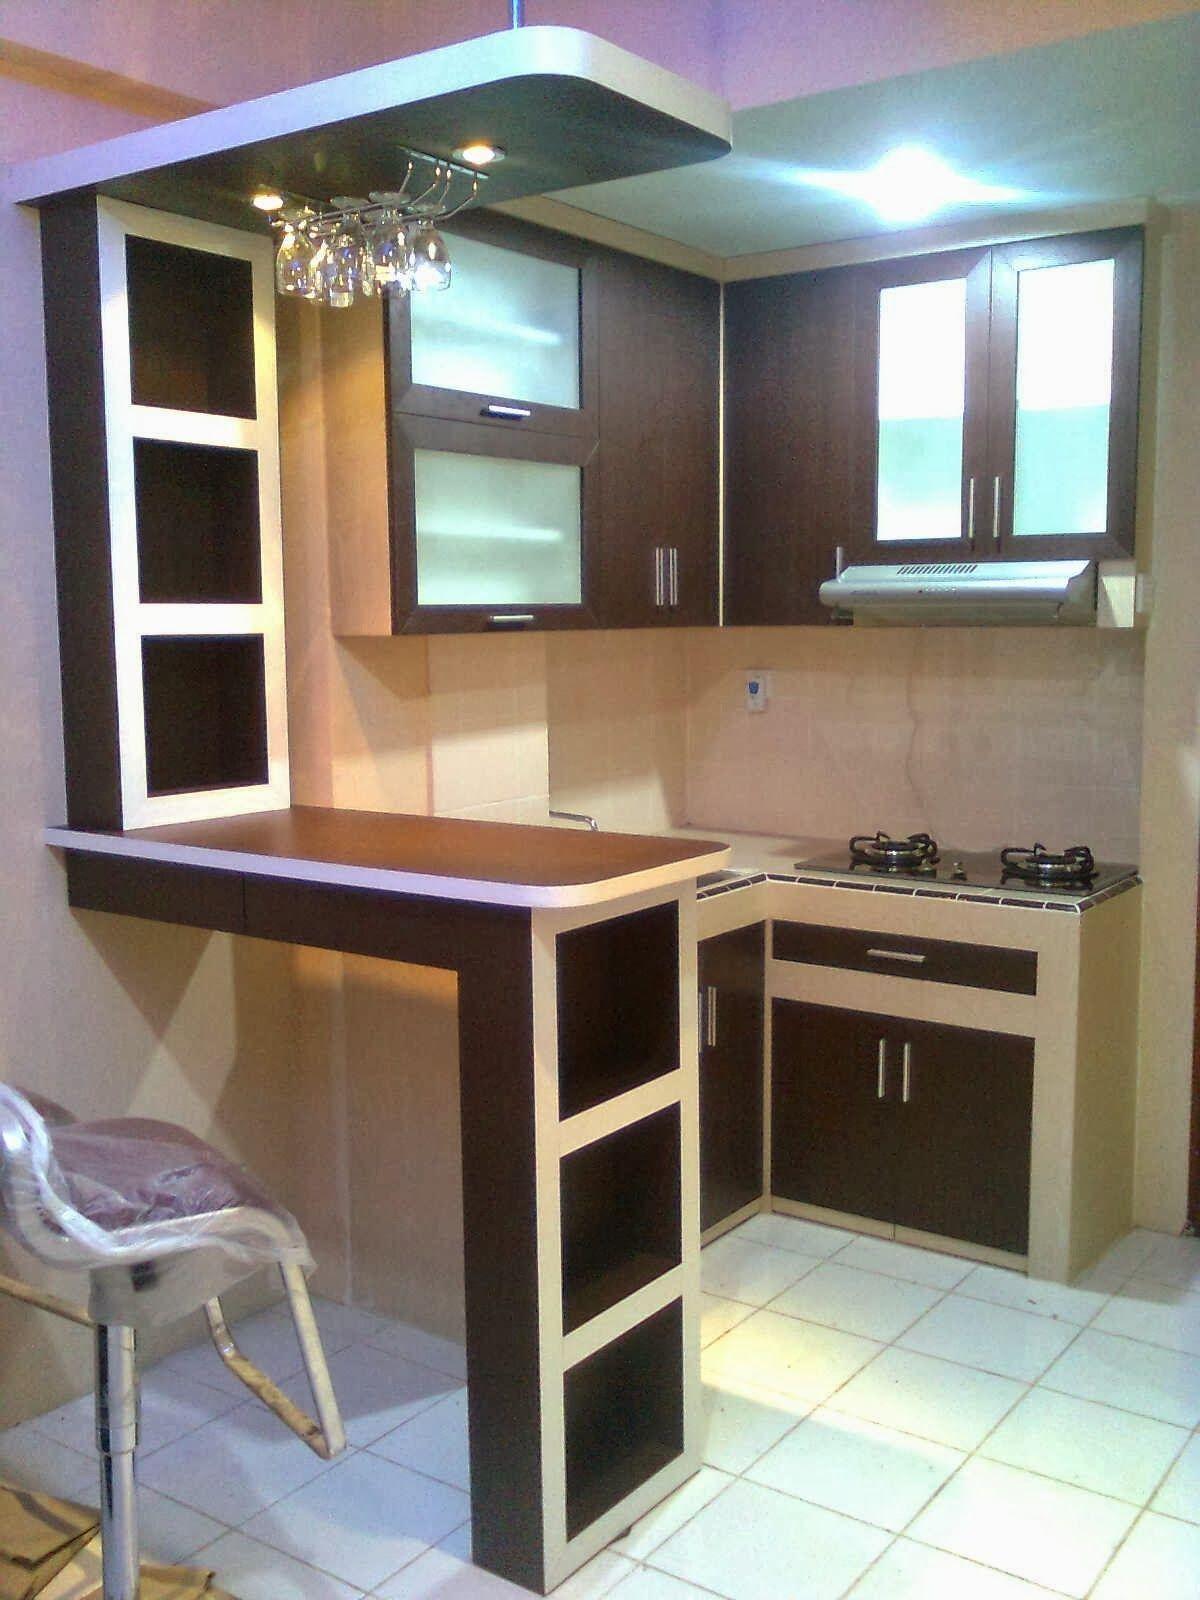 Http Furniture Kitchensetbogormurah Com Jasa Kitchen Set Sederhana Ide Dekorasi Rumah Dapur Kecil Dapur